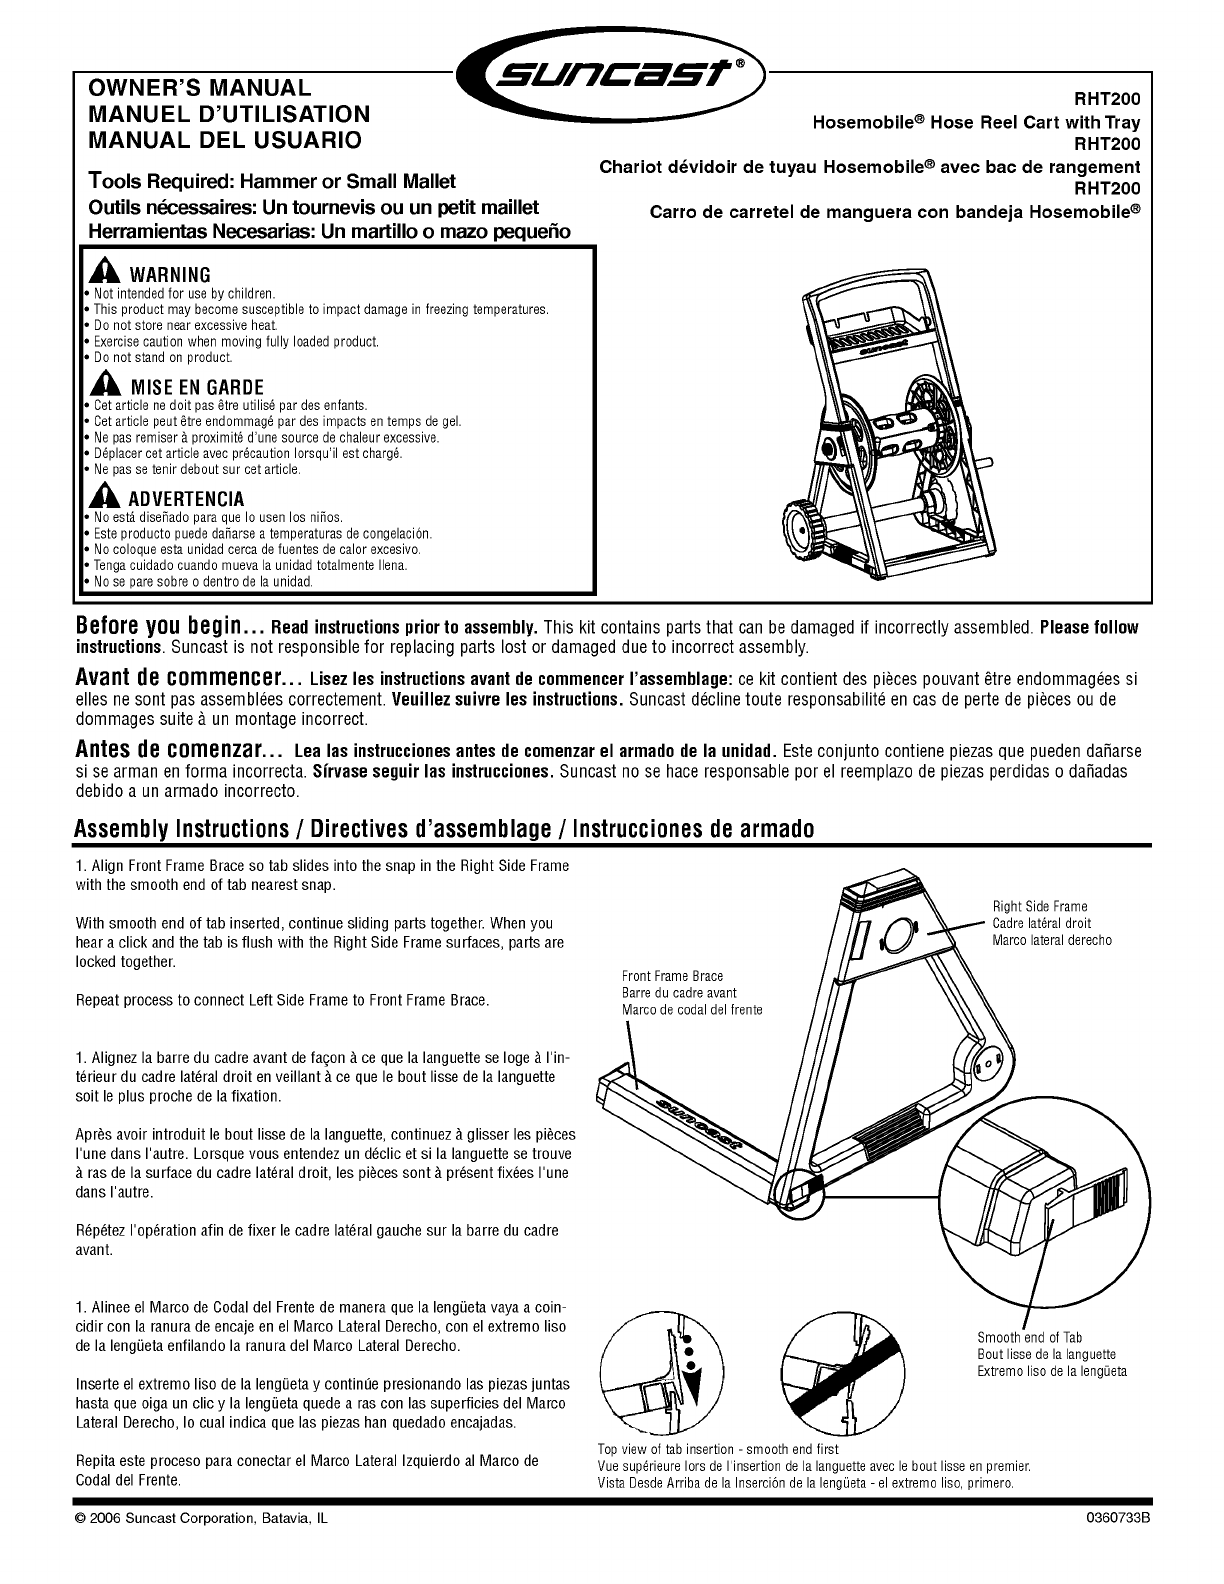 Suncast Hose Reel Cart Instruction Manual  ManualsonlineCom